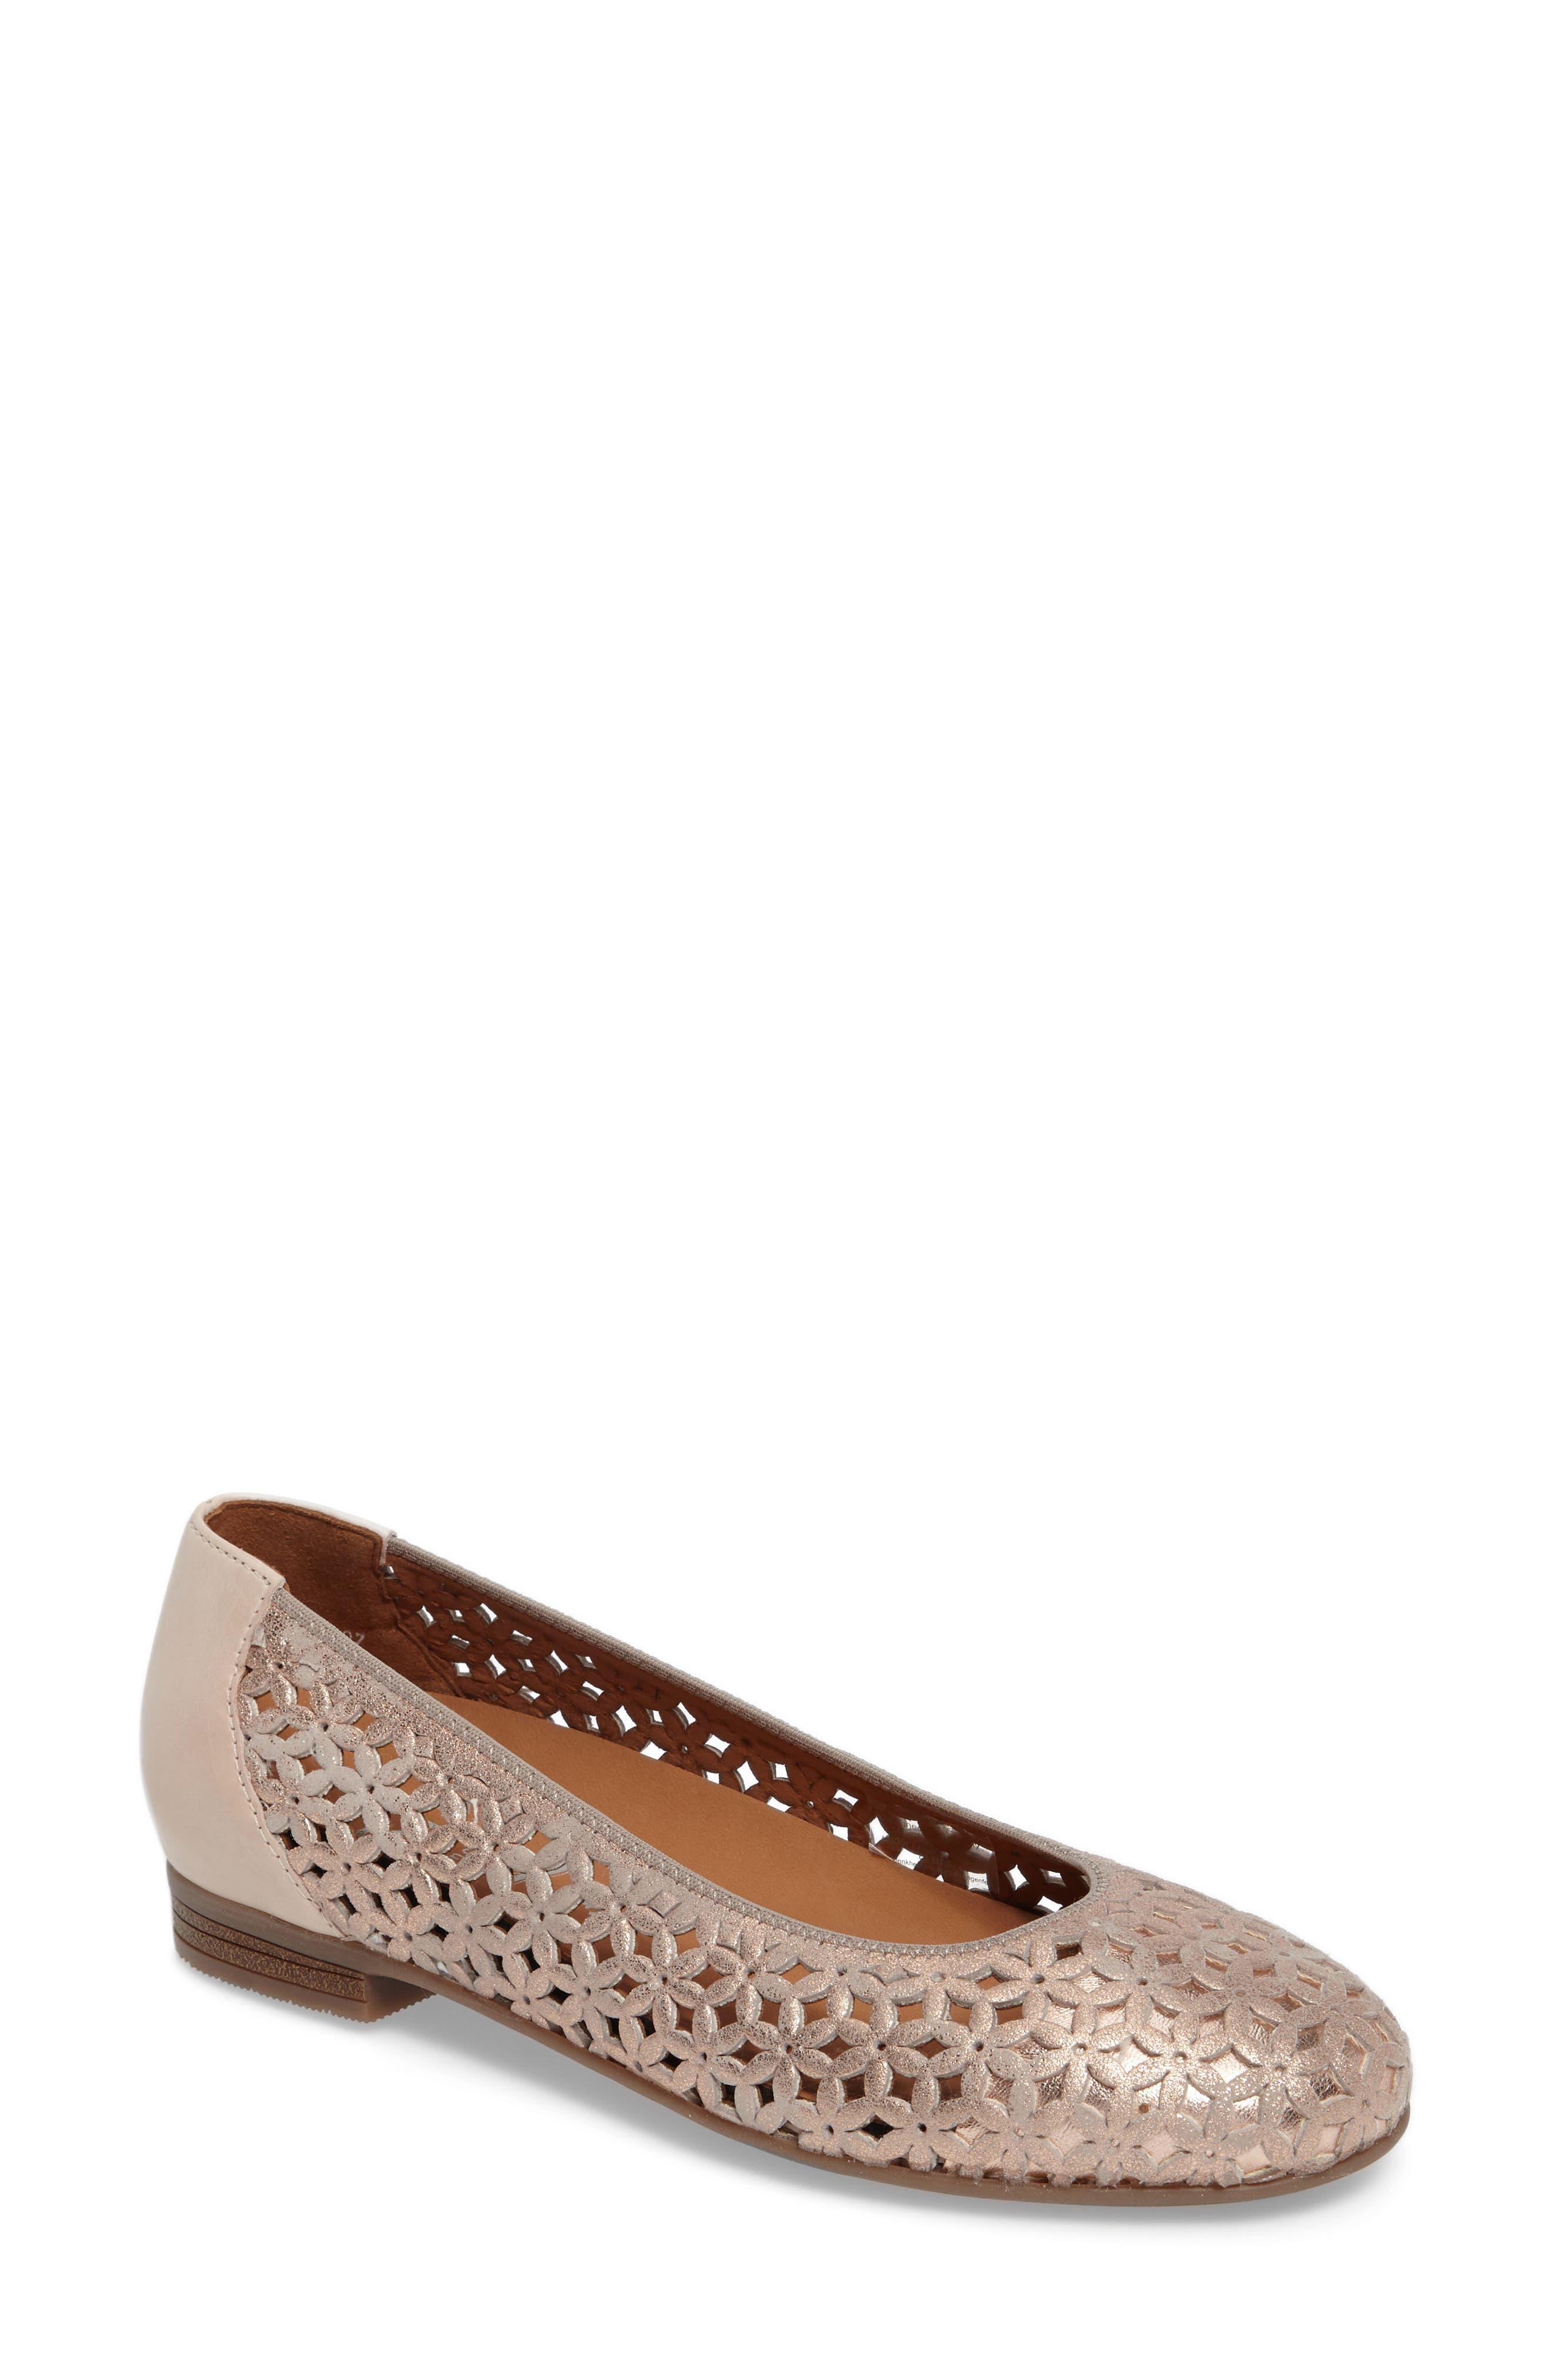 Ara Stephanie Perforated Ballet Flat